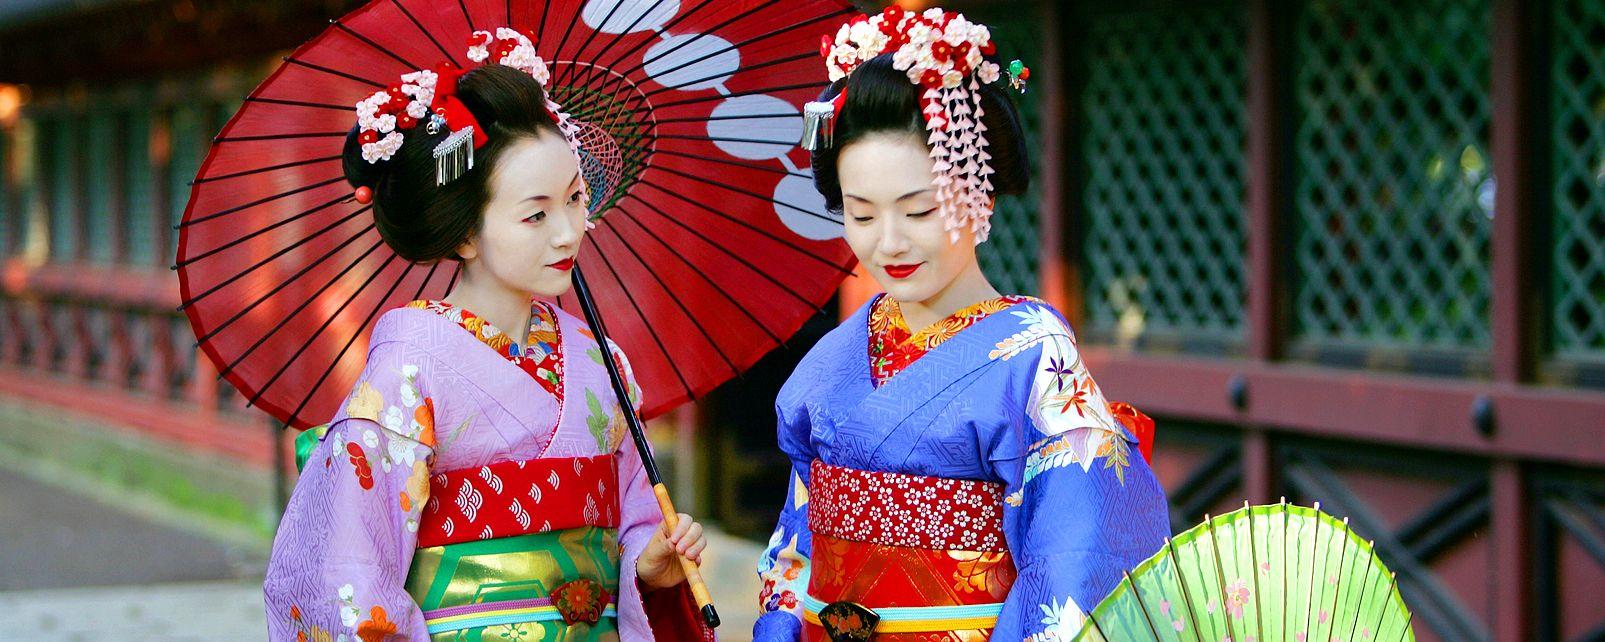 Geishas, Sumo, Traditions, Japan